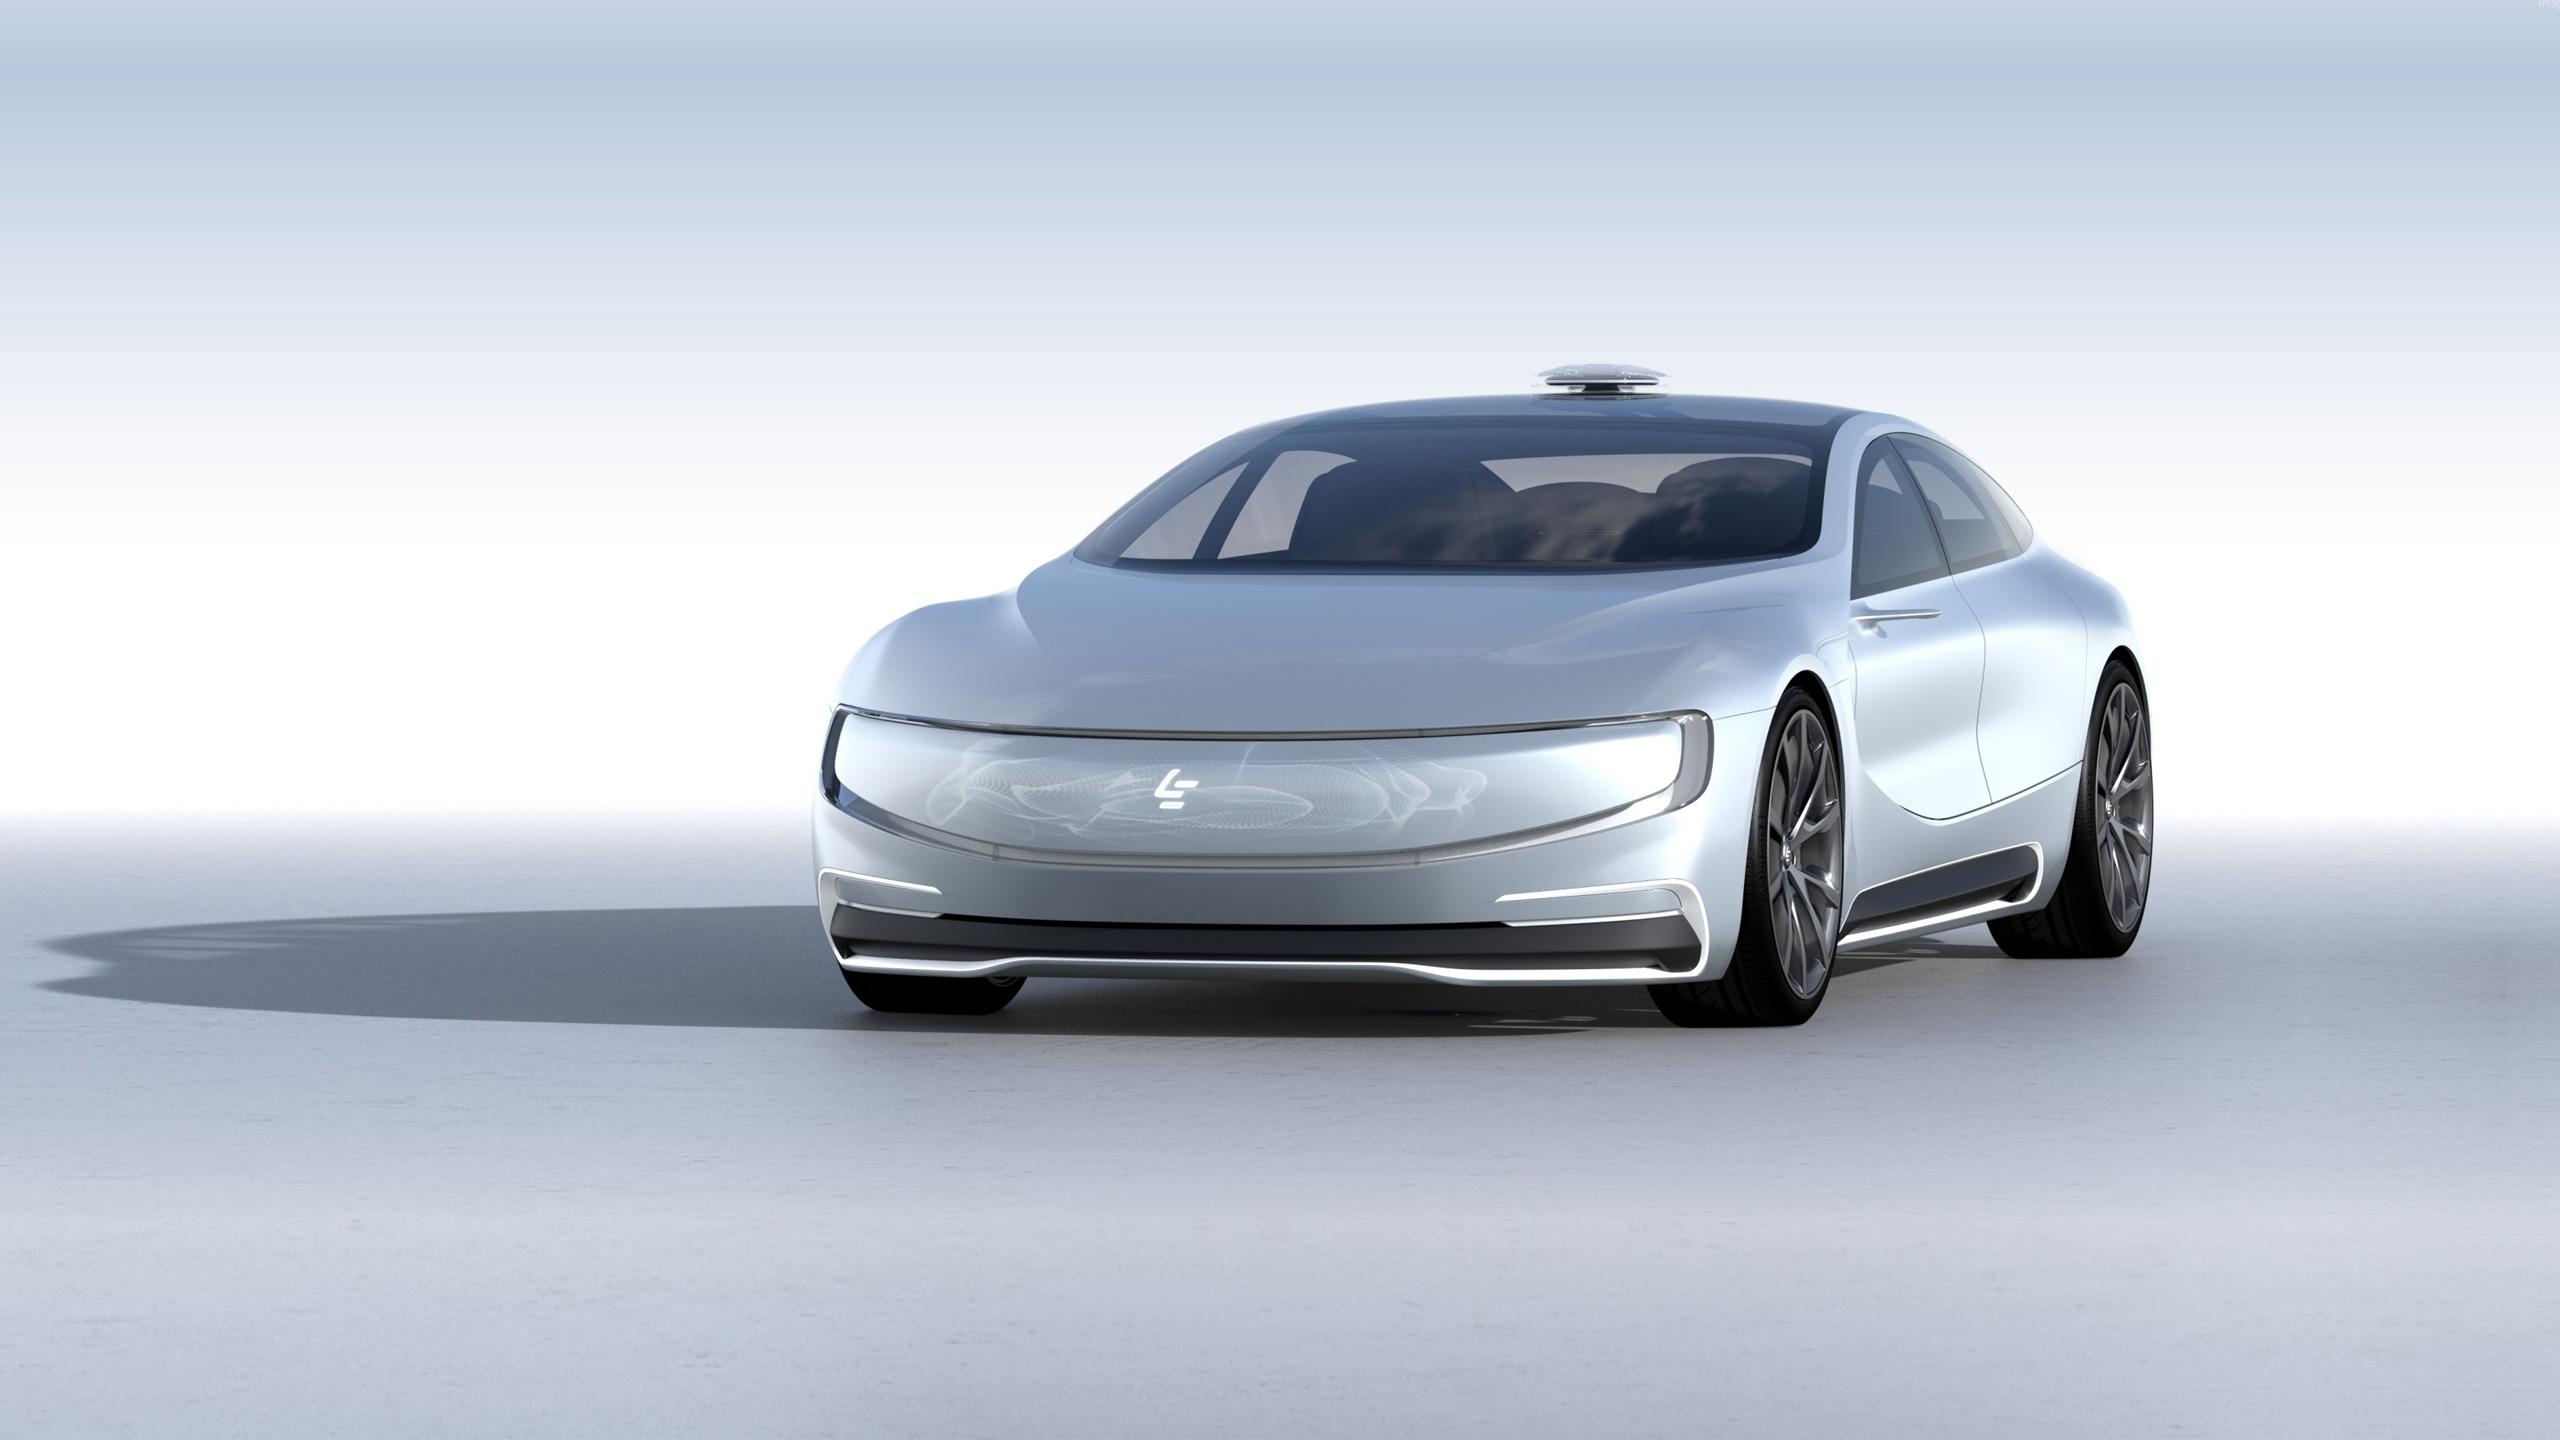 LeEco LeSEE Electric Concept Car Wallpaper HD Car Wallpapers 2560x1440